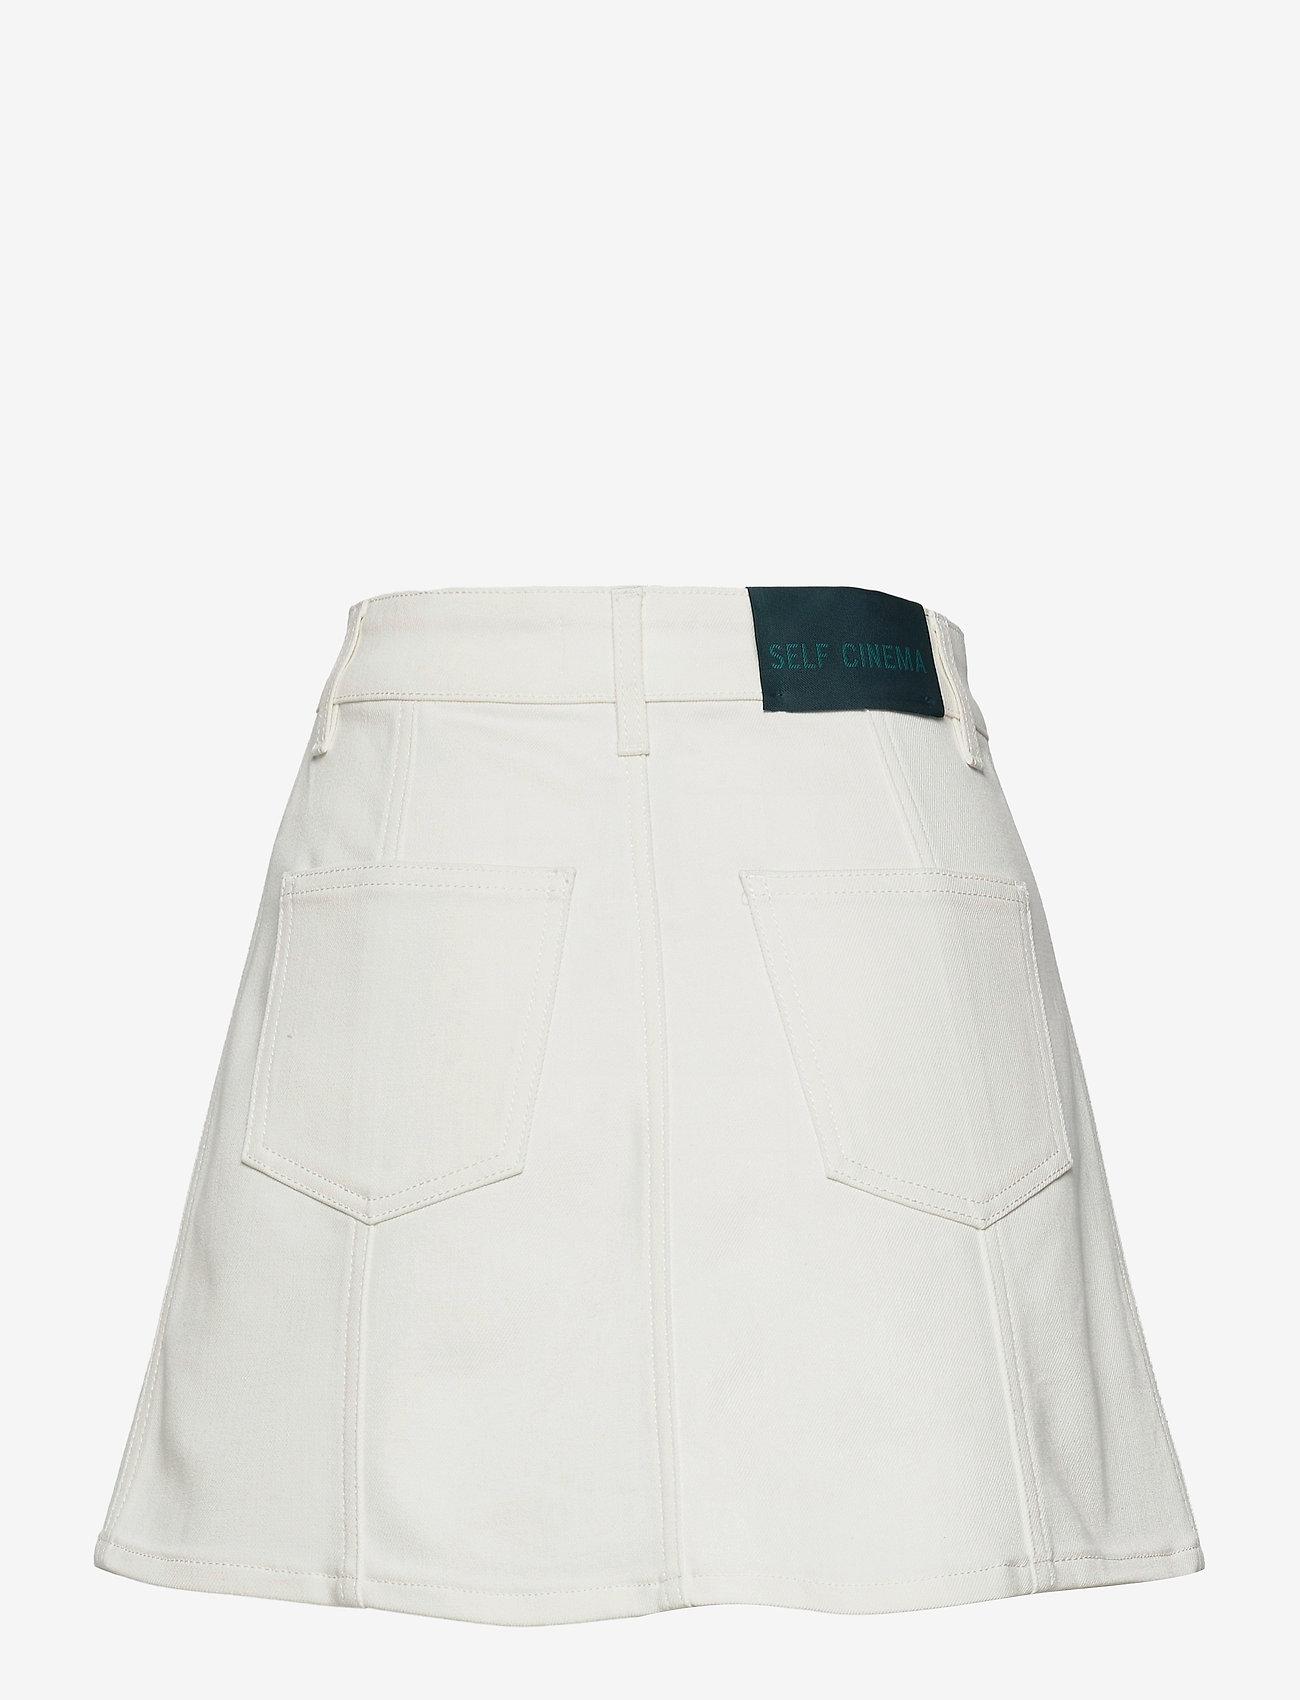 Self Cinema - Womens Denim Skirt - denim skirts - white - 1